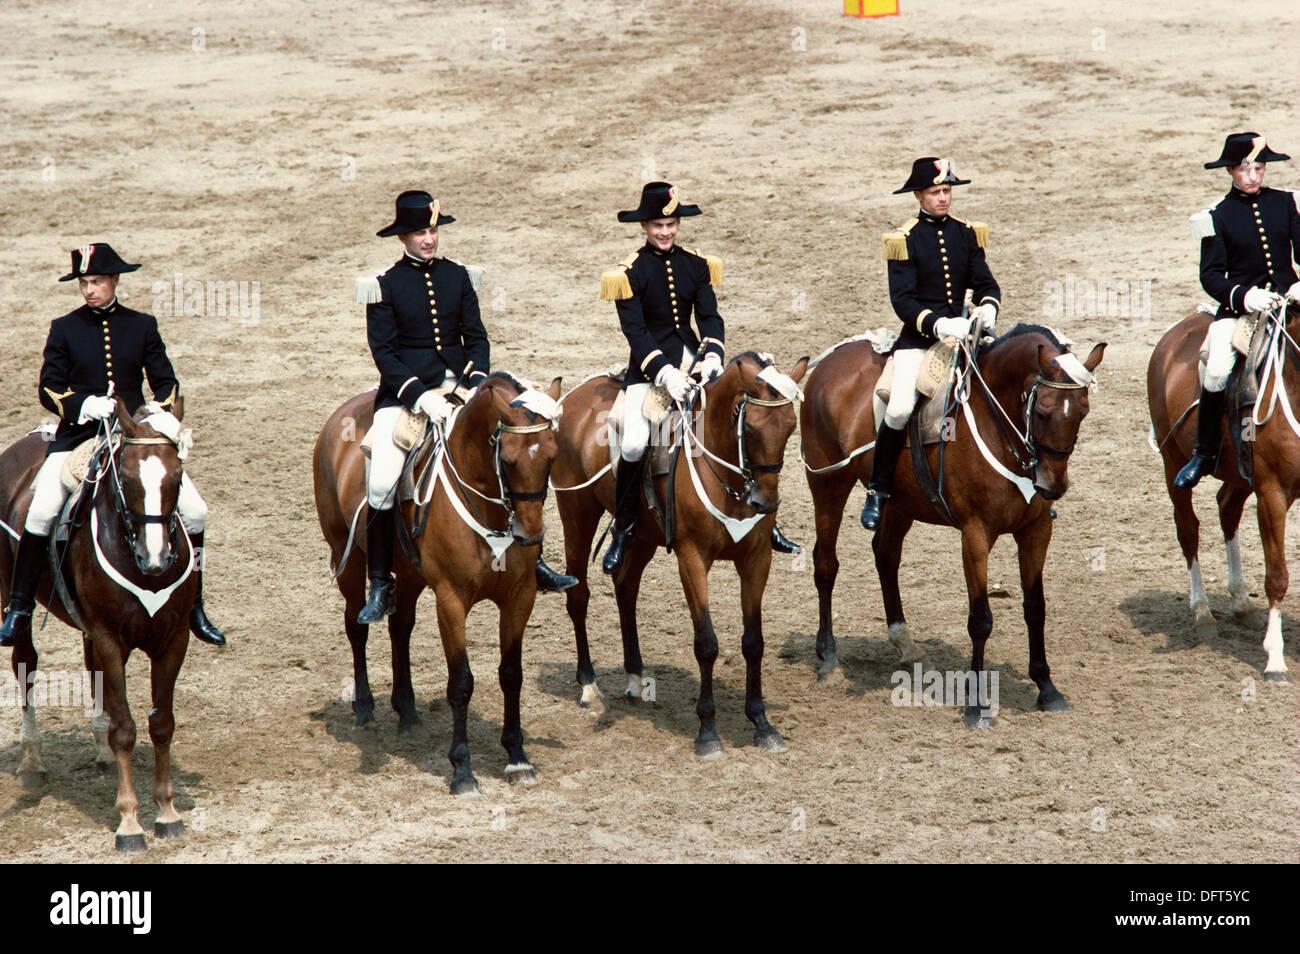 The Carrousel, Cadre Noir Cavalry Academy. Saumur. Val de Loire, France - Stock Image